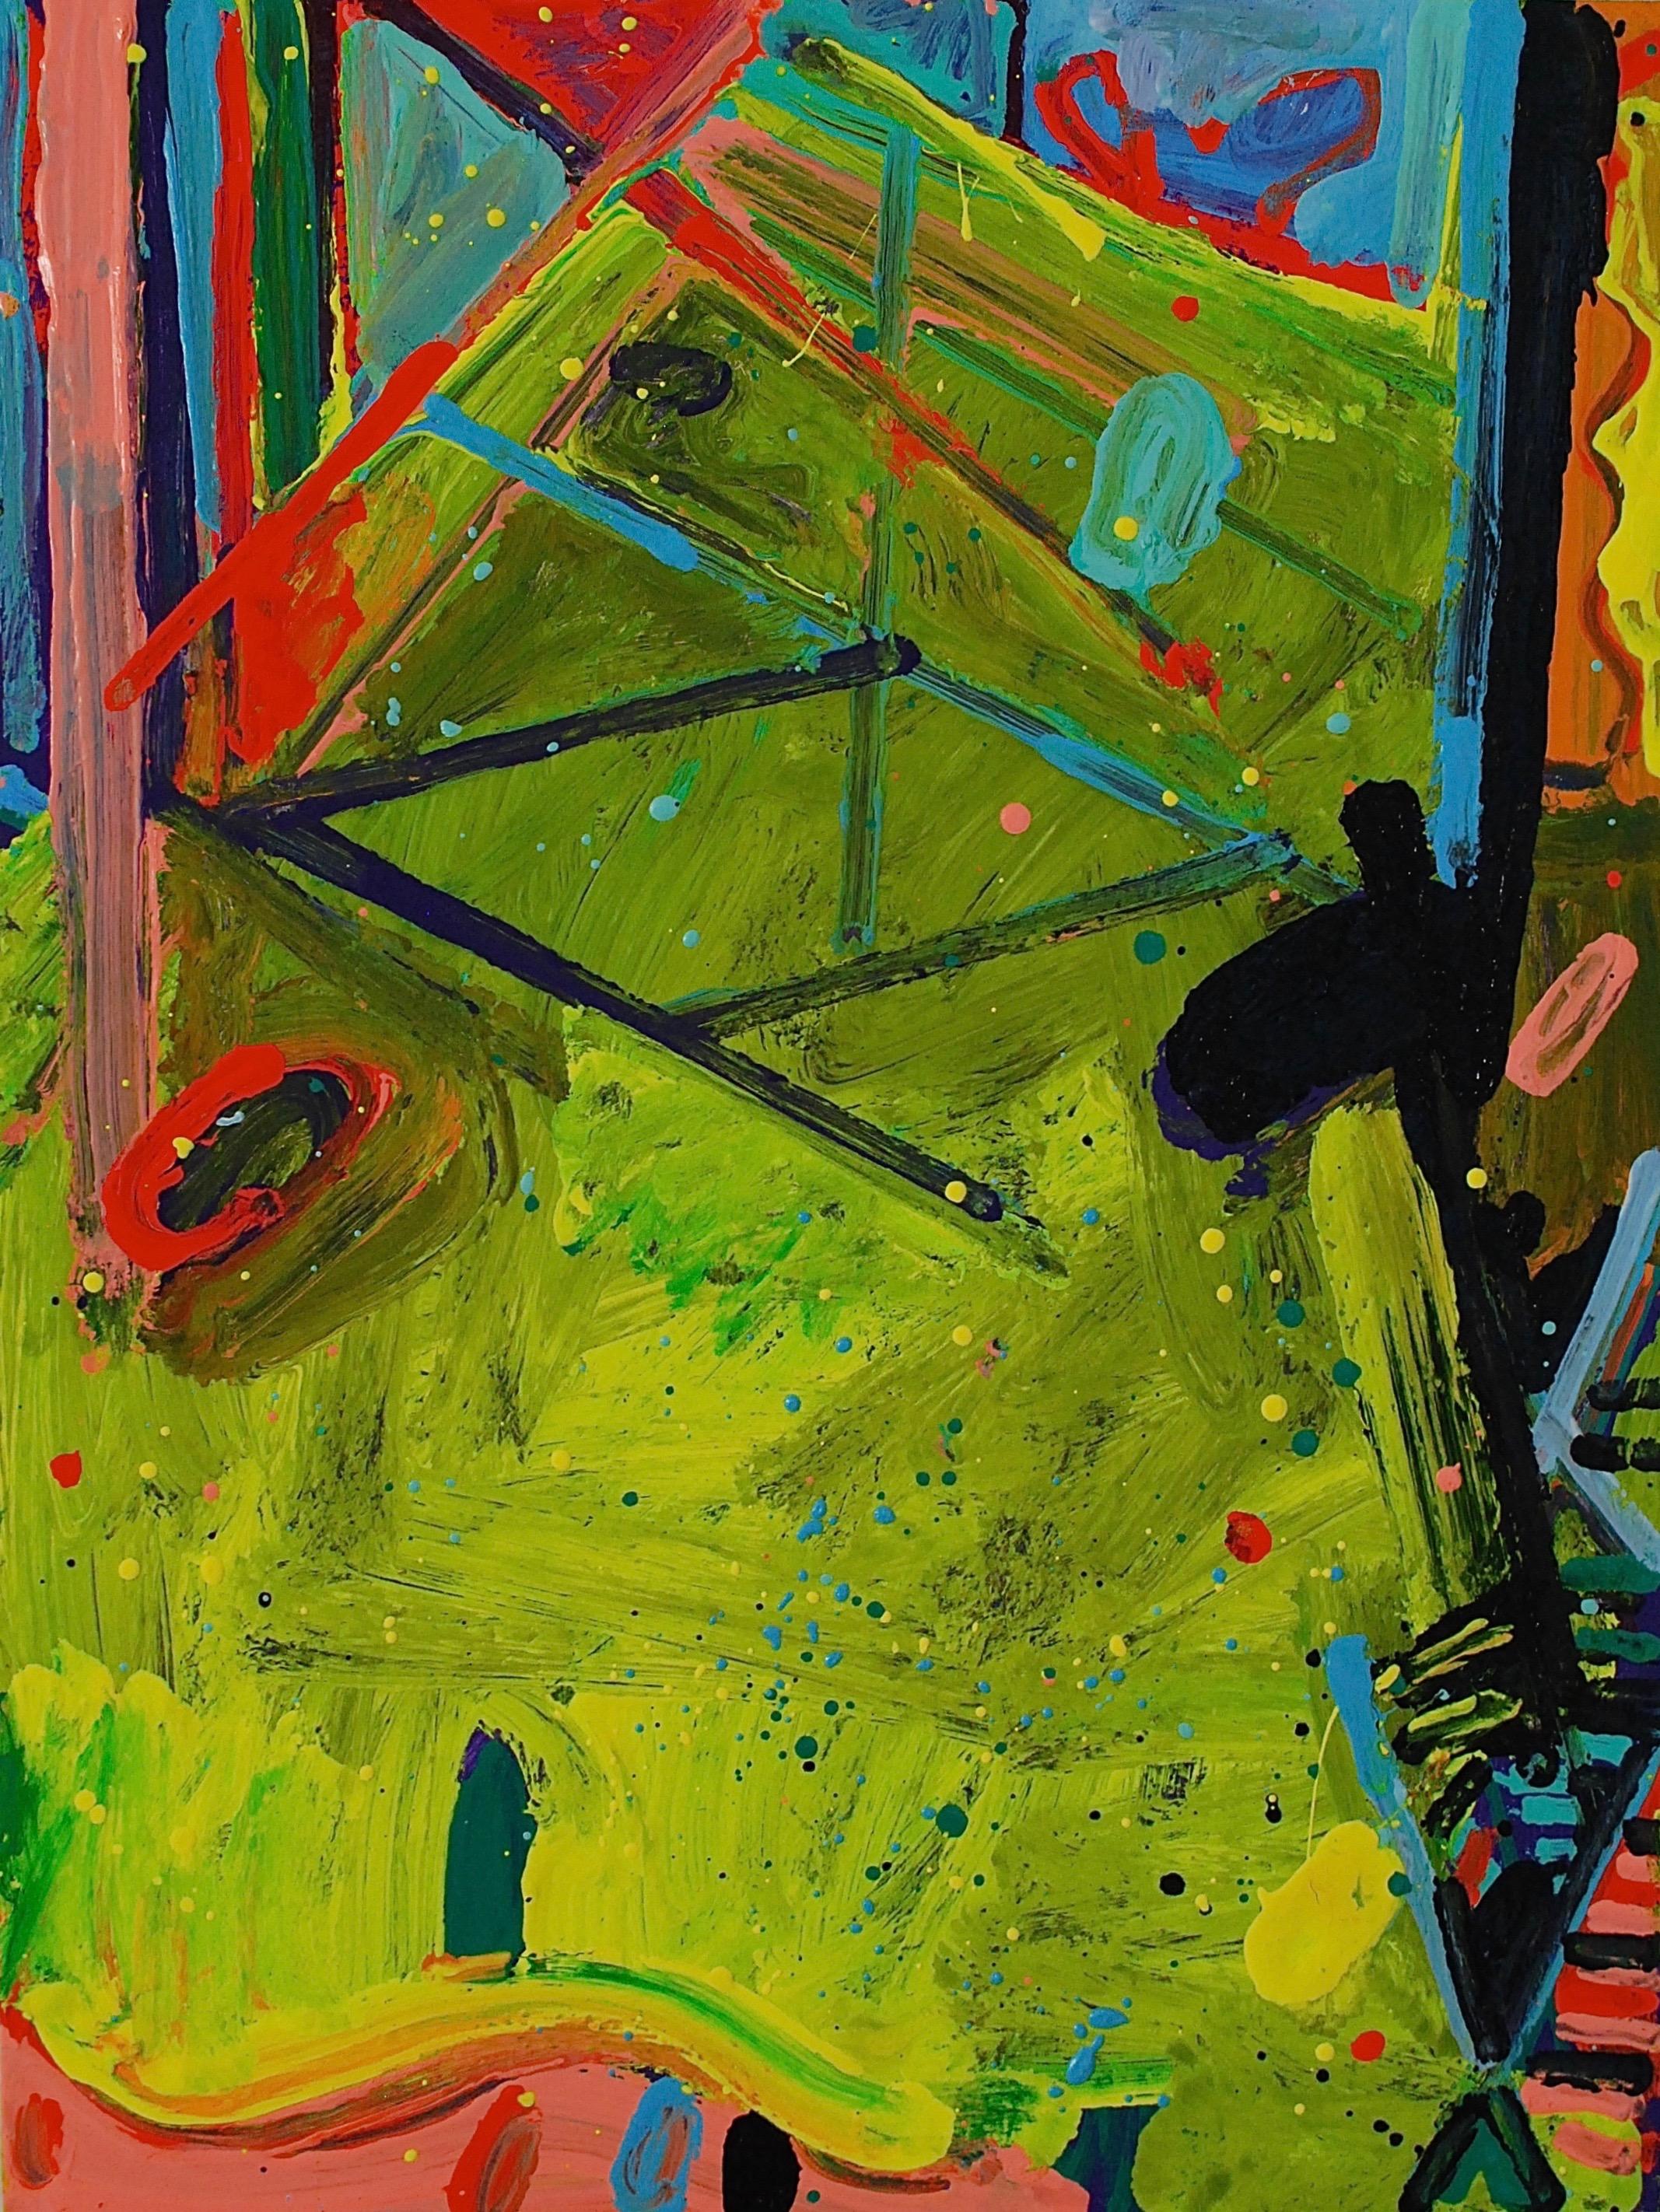 "Peter Reginato, Green One"", 2015. Enamel on wood panel, 24 x18 in."